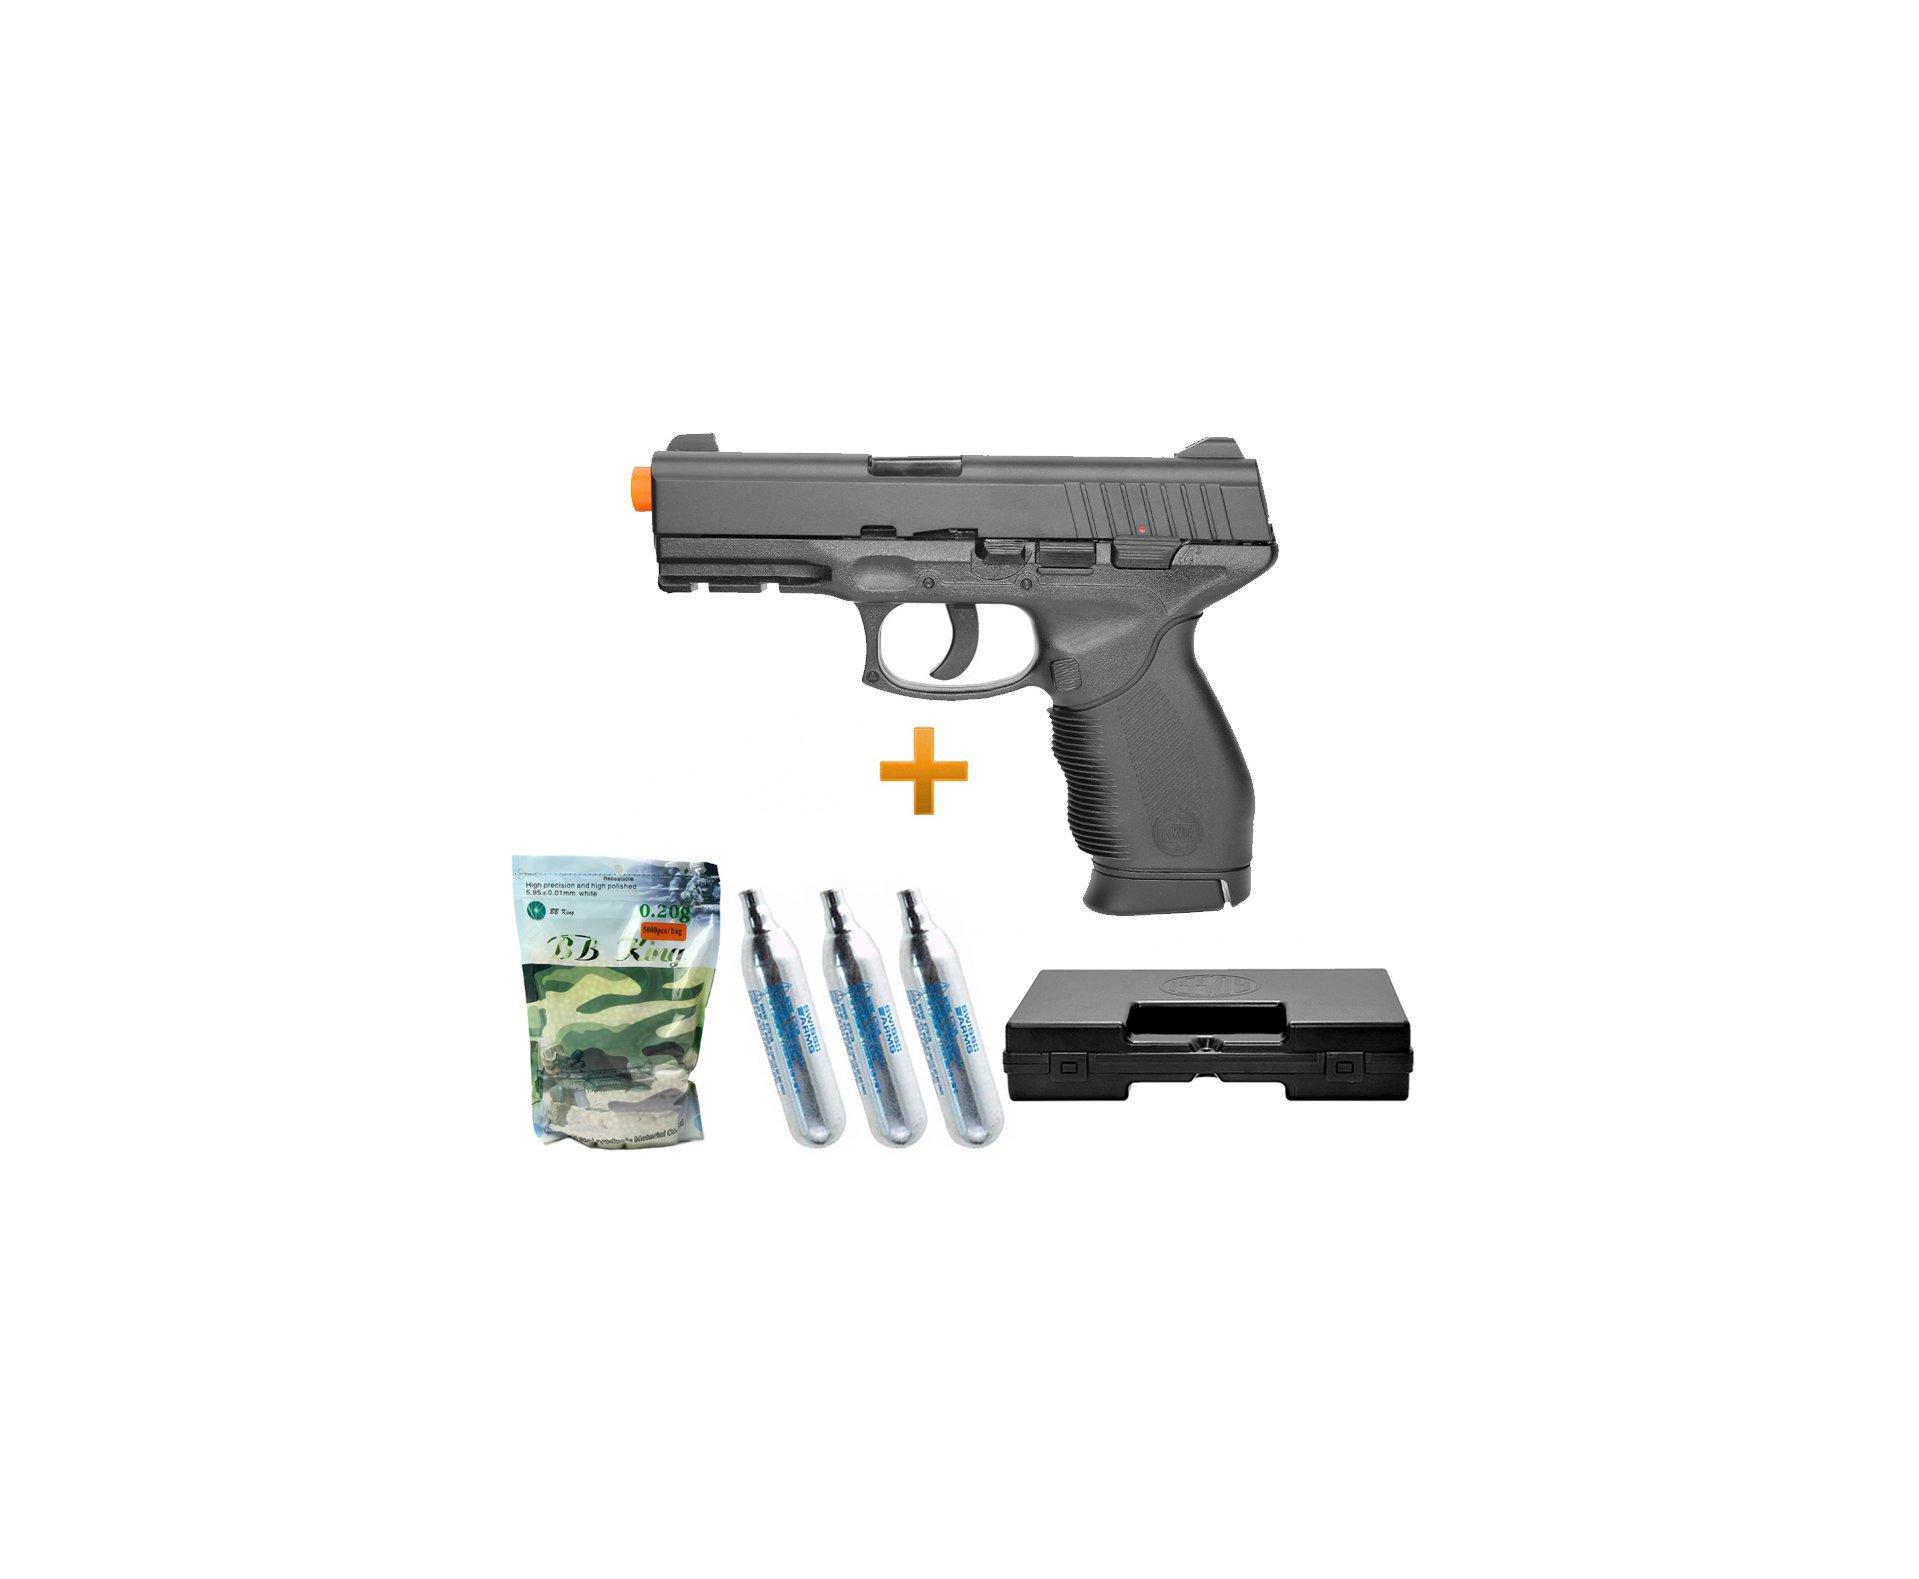 Pistola De Airsoft Gas Co2 Pt 24/7 Slide Metal Cal 6.0mm Kwc + Case + Bbs + Co2